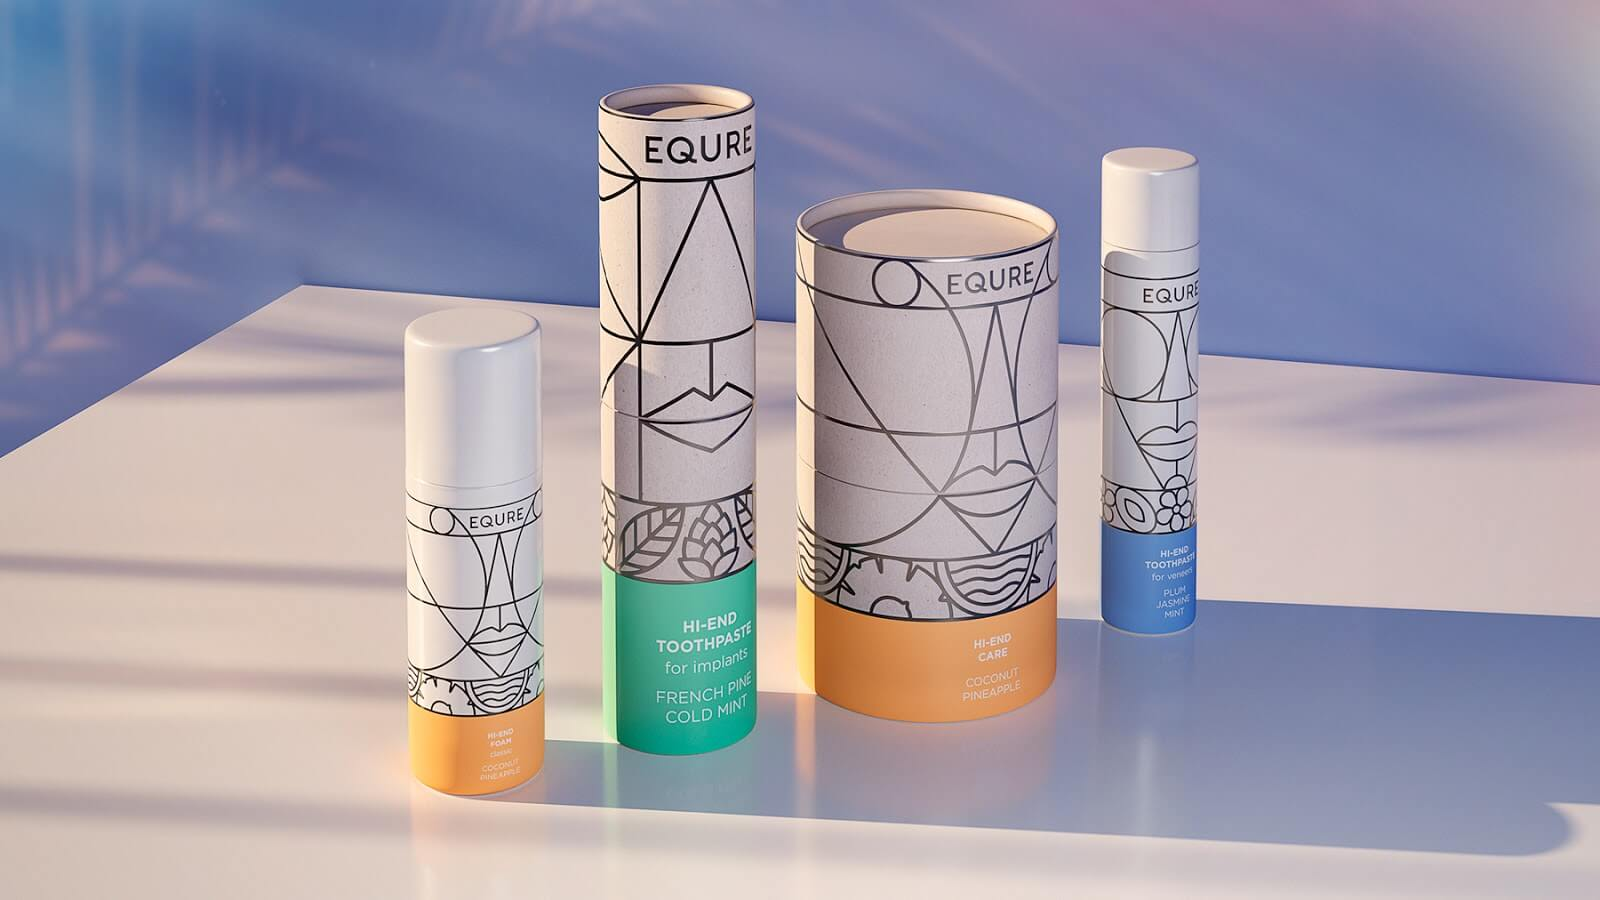 equre tube packaging